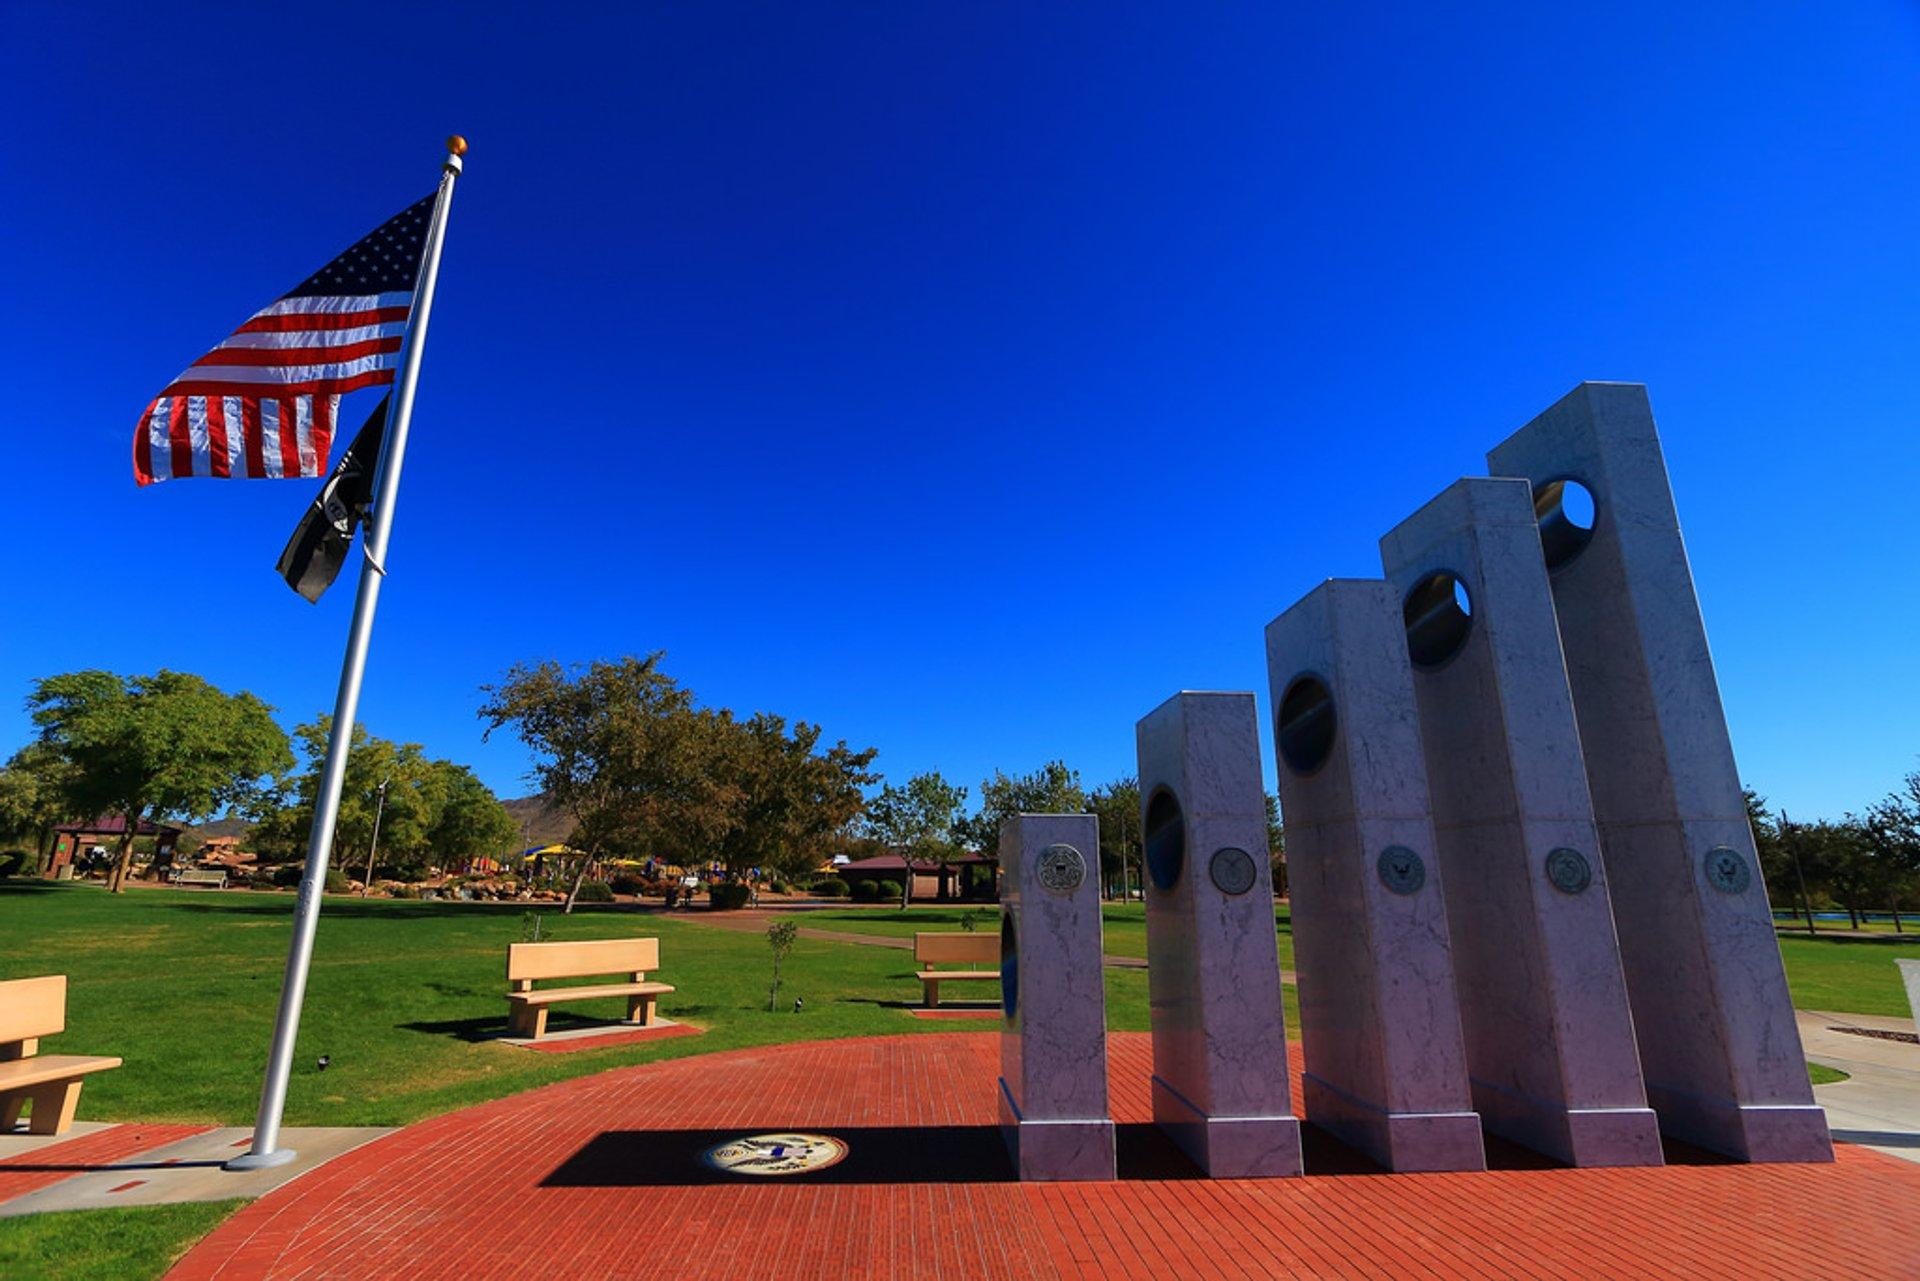 Solar Spotlight at the Anthem Veterans Memorial in Arizona 2020 - Best Time